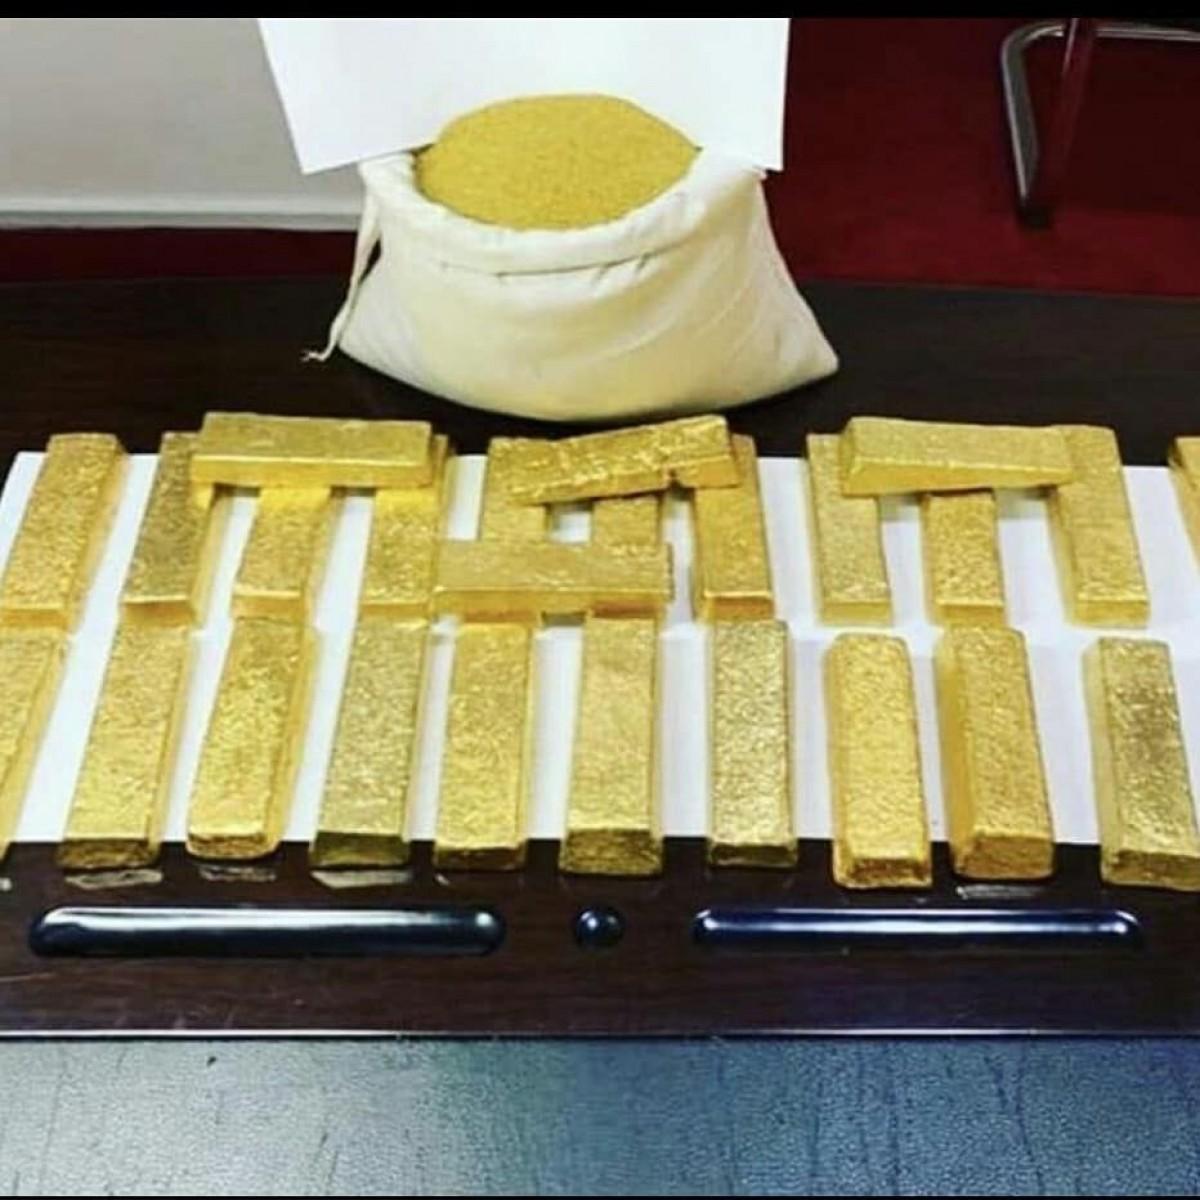 Gold on sell call now  +27613119008 in south africa Greece, Greenland Bahrain,Iraq,Kuwait,Oman,Qatar,Saudi Arabia,UAE napel canada